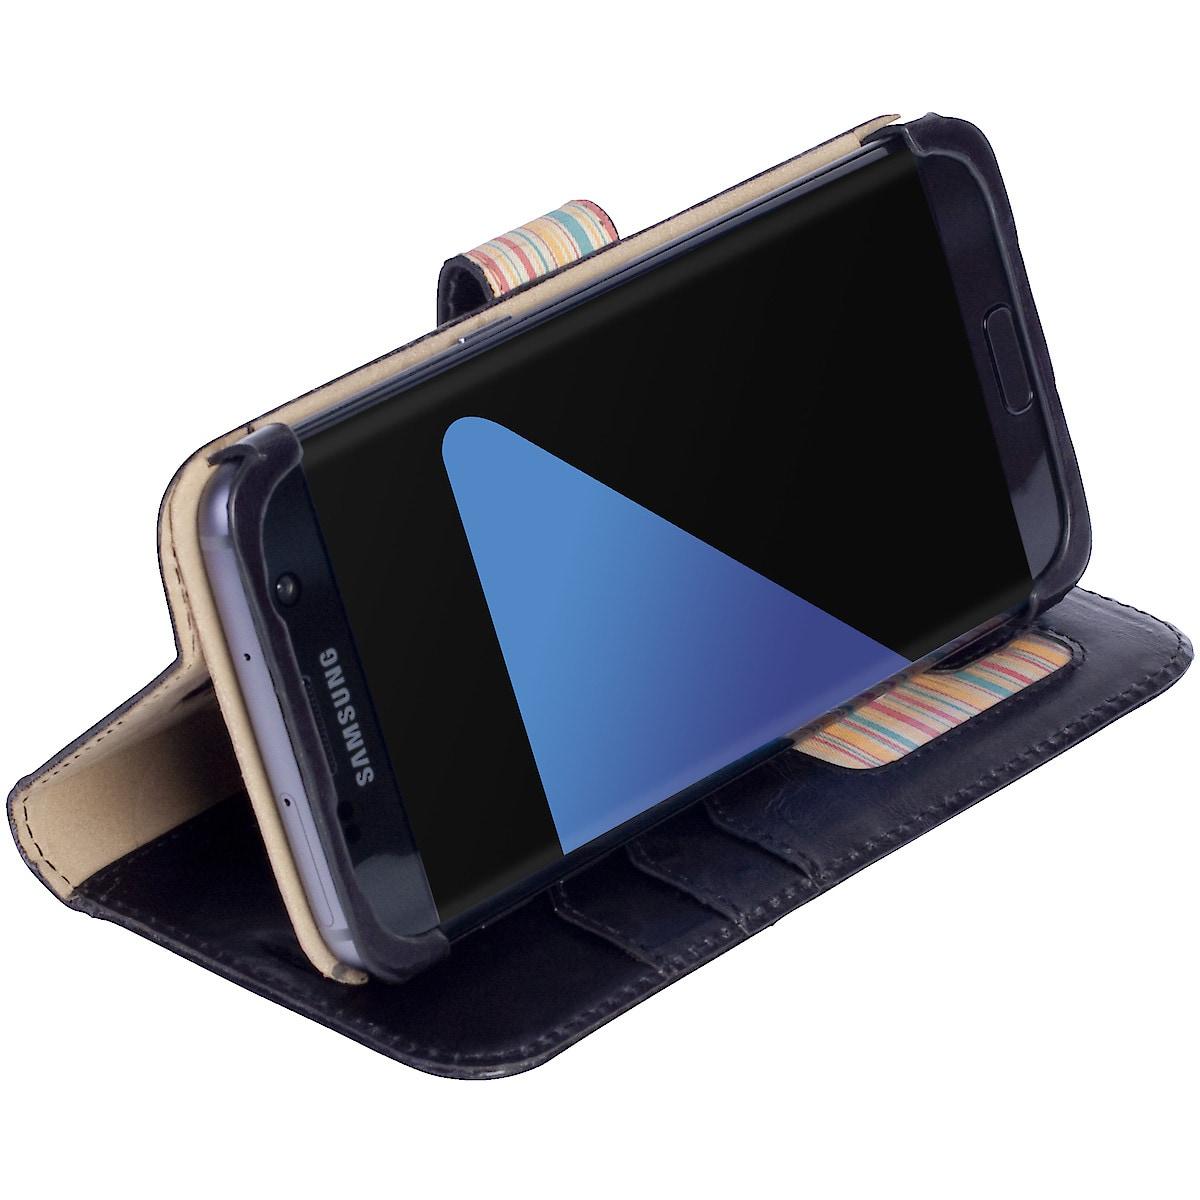 Lompakkokotelo Samsung Galaxy S7 Edge, Krusell Sigtuna FolioWallet